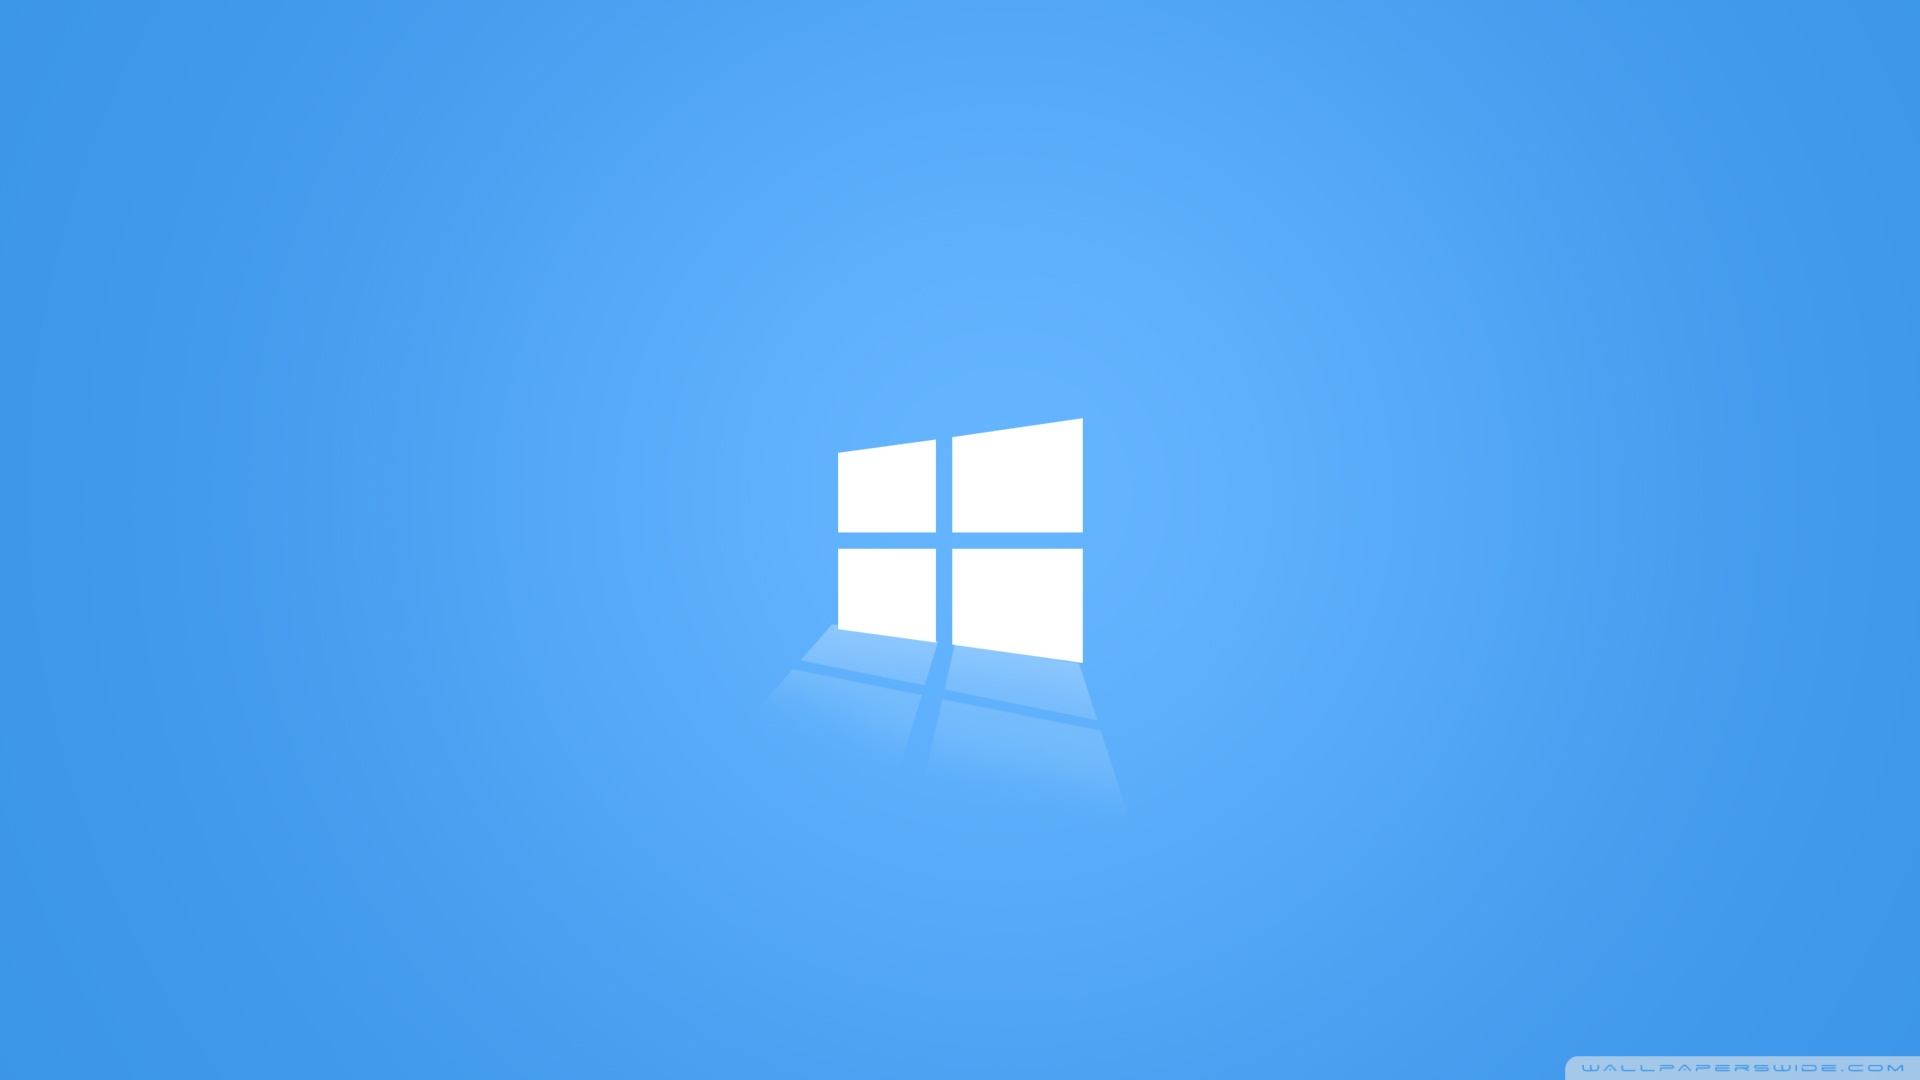 windows 10 wallpaper hd - sf wallpaper